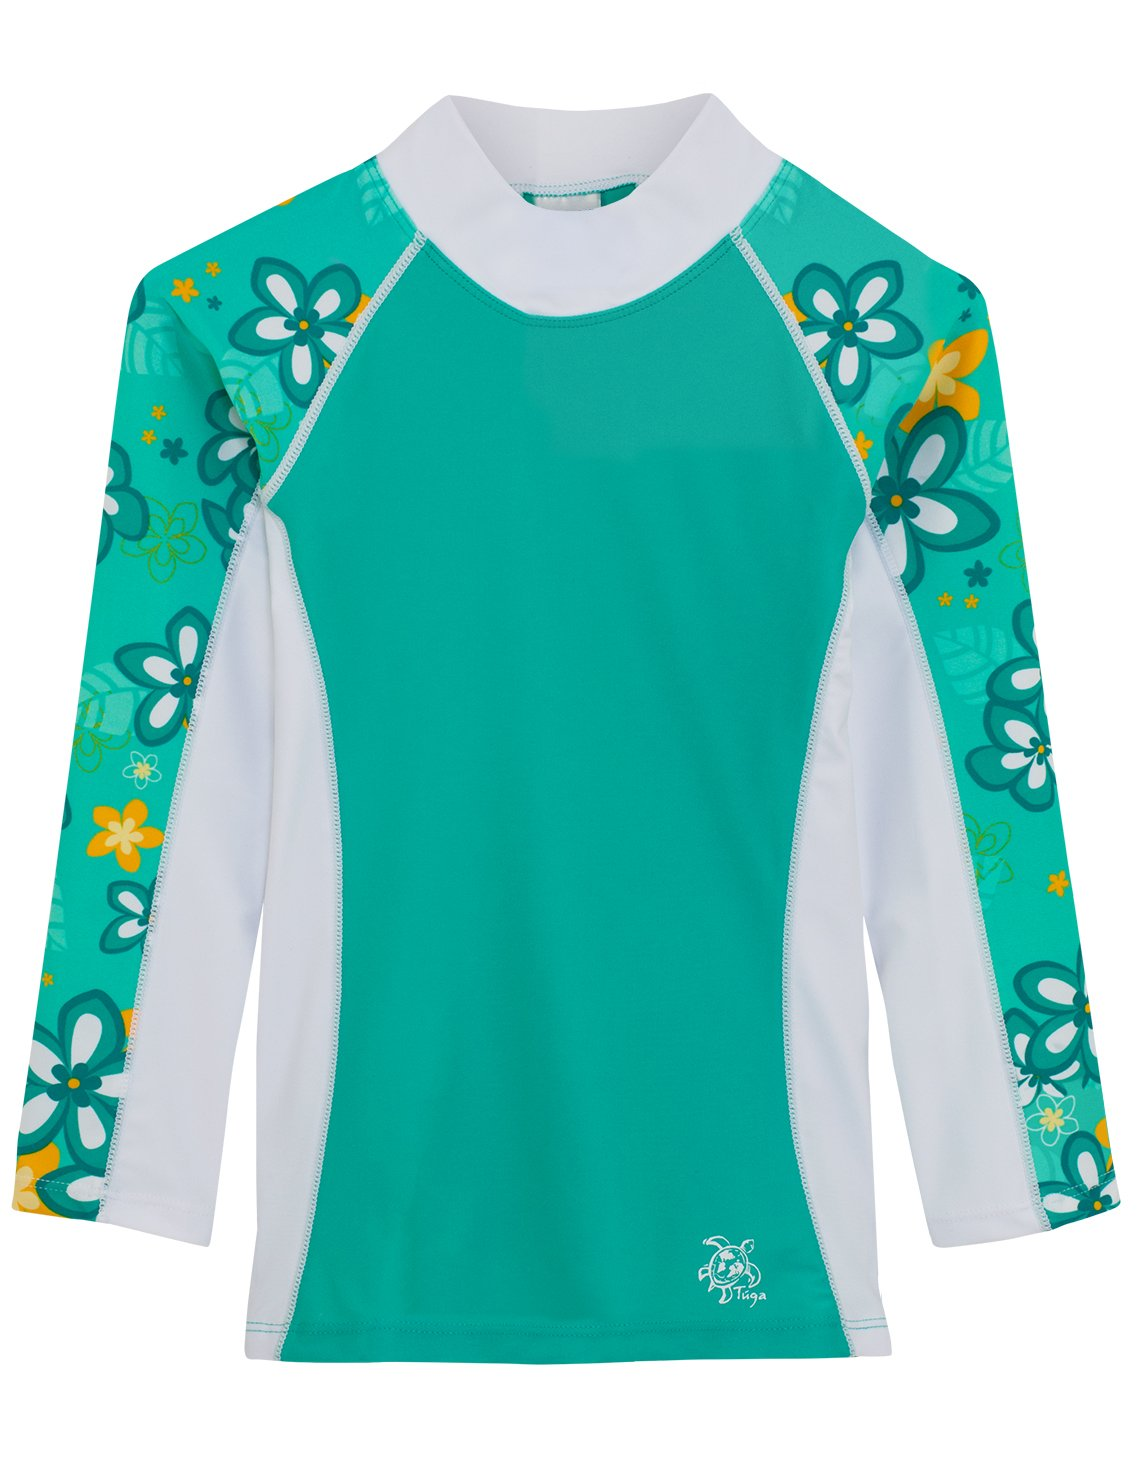 Tuga Girls Long Sleeve Rash Guards 1-14 Years, UPF 50+ Sun Protection Swim Shirt